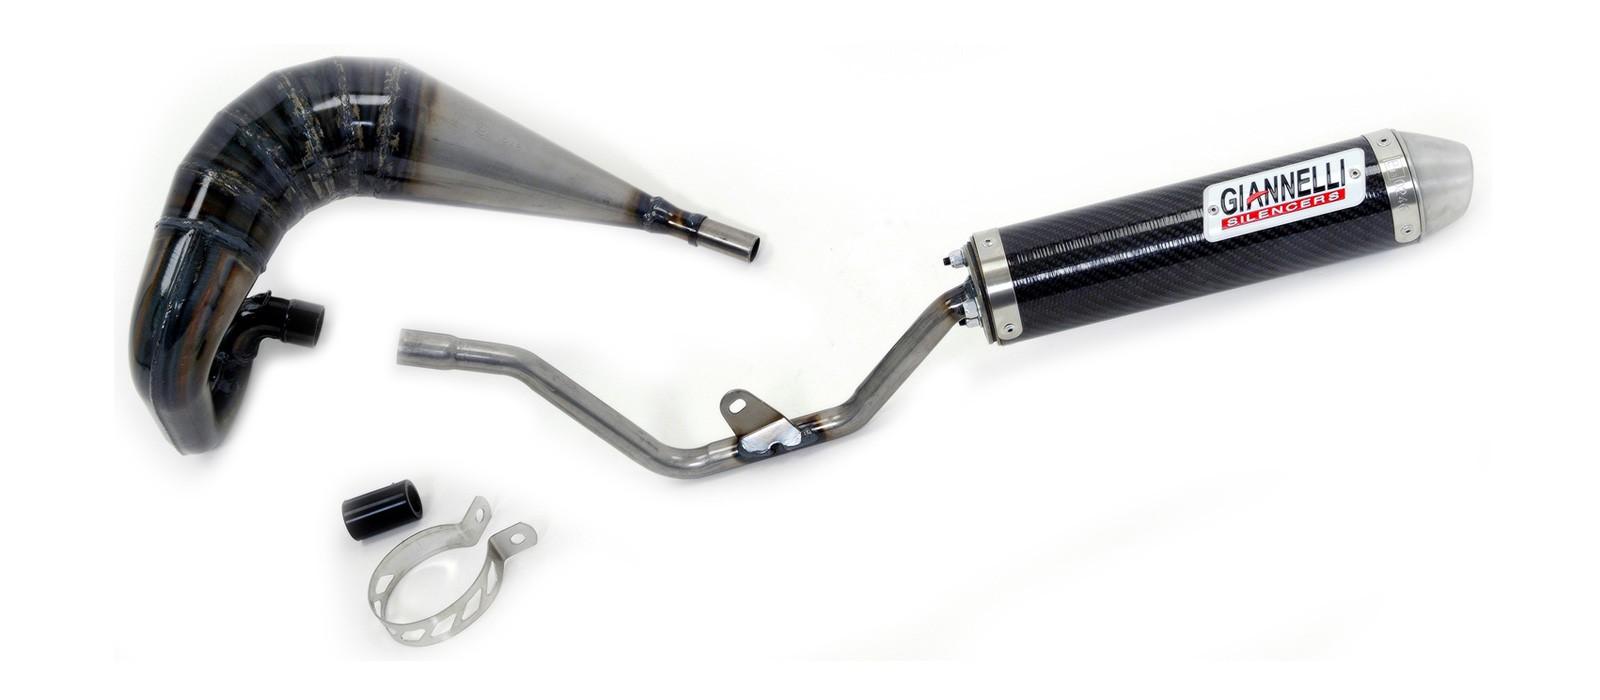 ESCAPES GIANNELLI PEUGEOT - Silenciador aluminio enduro/cross 2T Peugeot XP6 SM 50 Giannelli 34679HF -